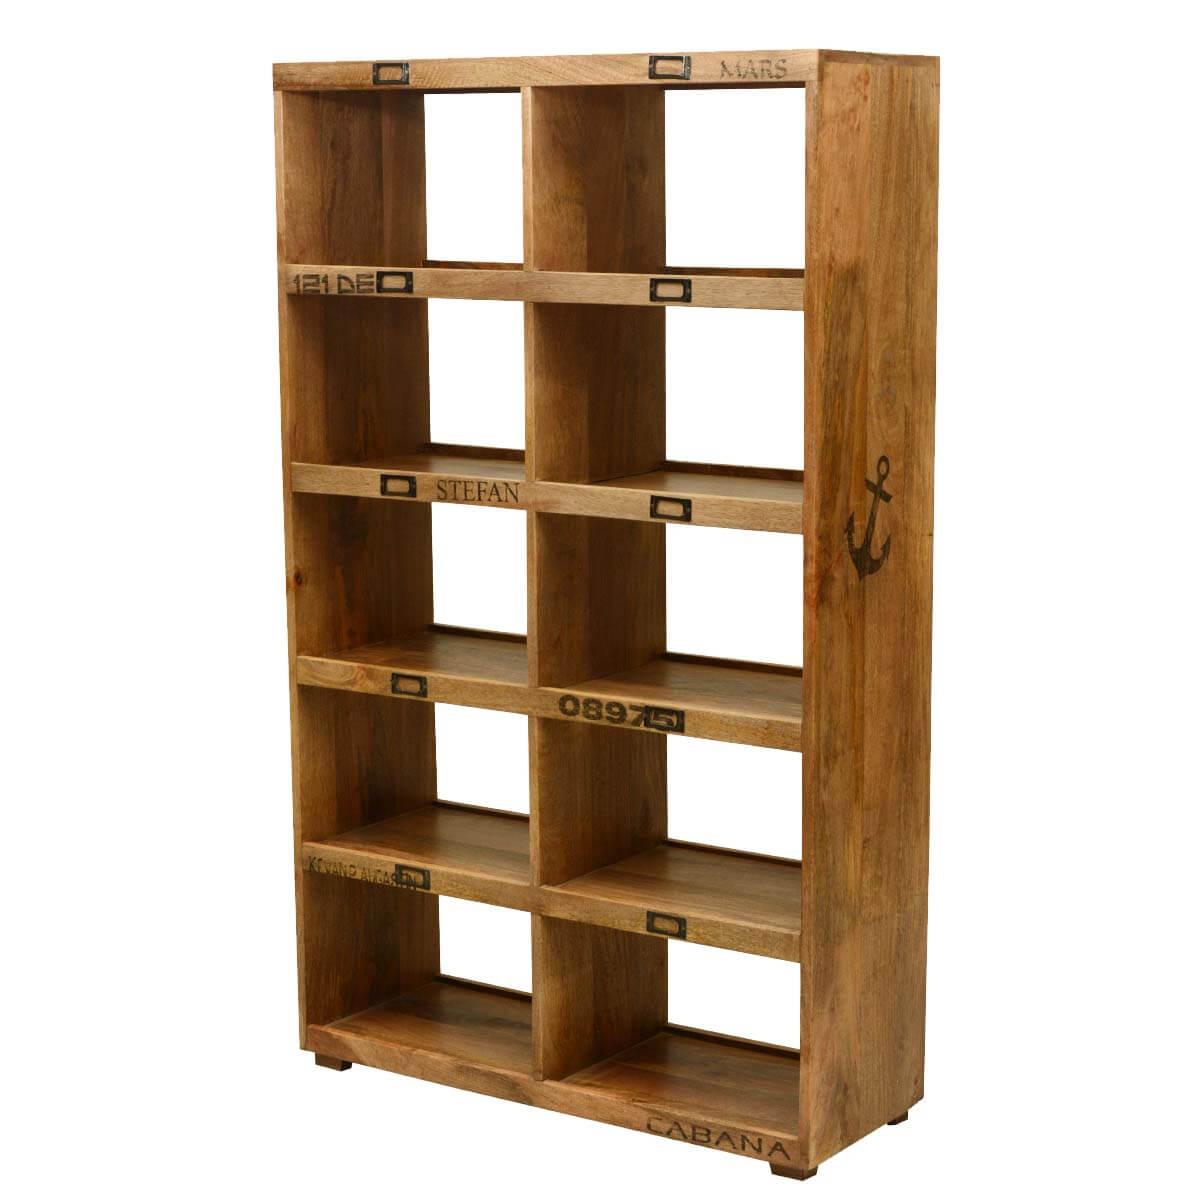 Brampton 10 Open Shelf Rustic Solid Wood Cube Bookcase